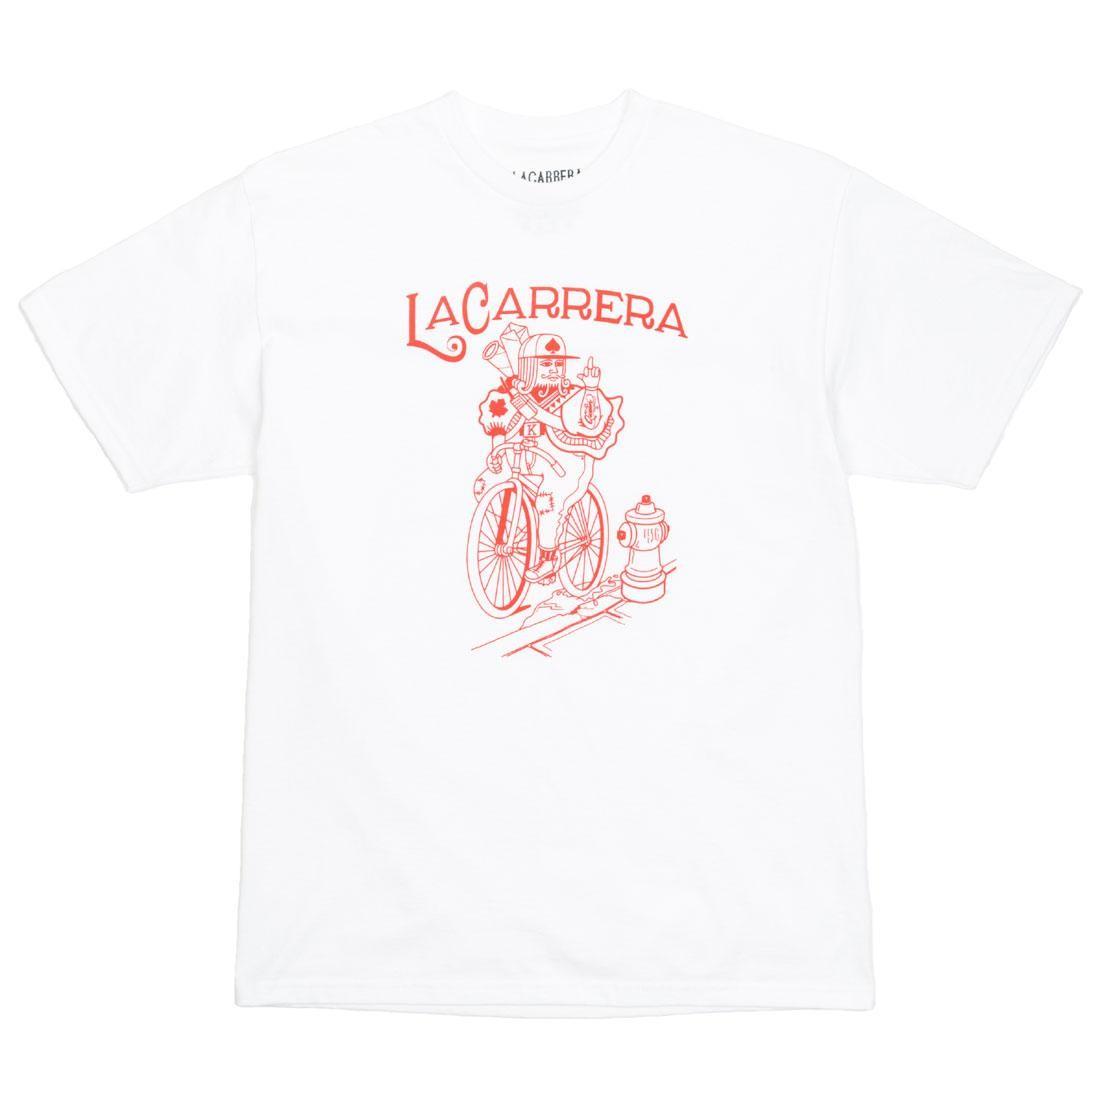 La Carrera Men The King Rides Again Tee - Japan (white / red)